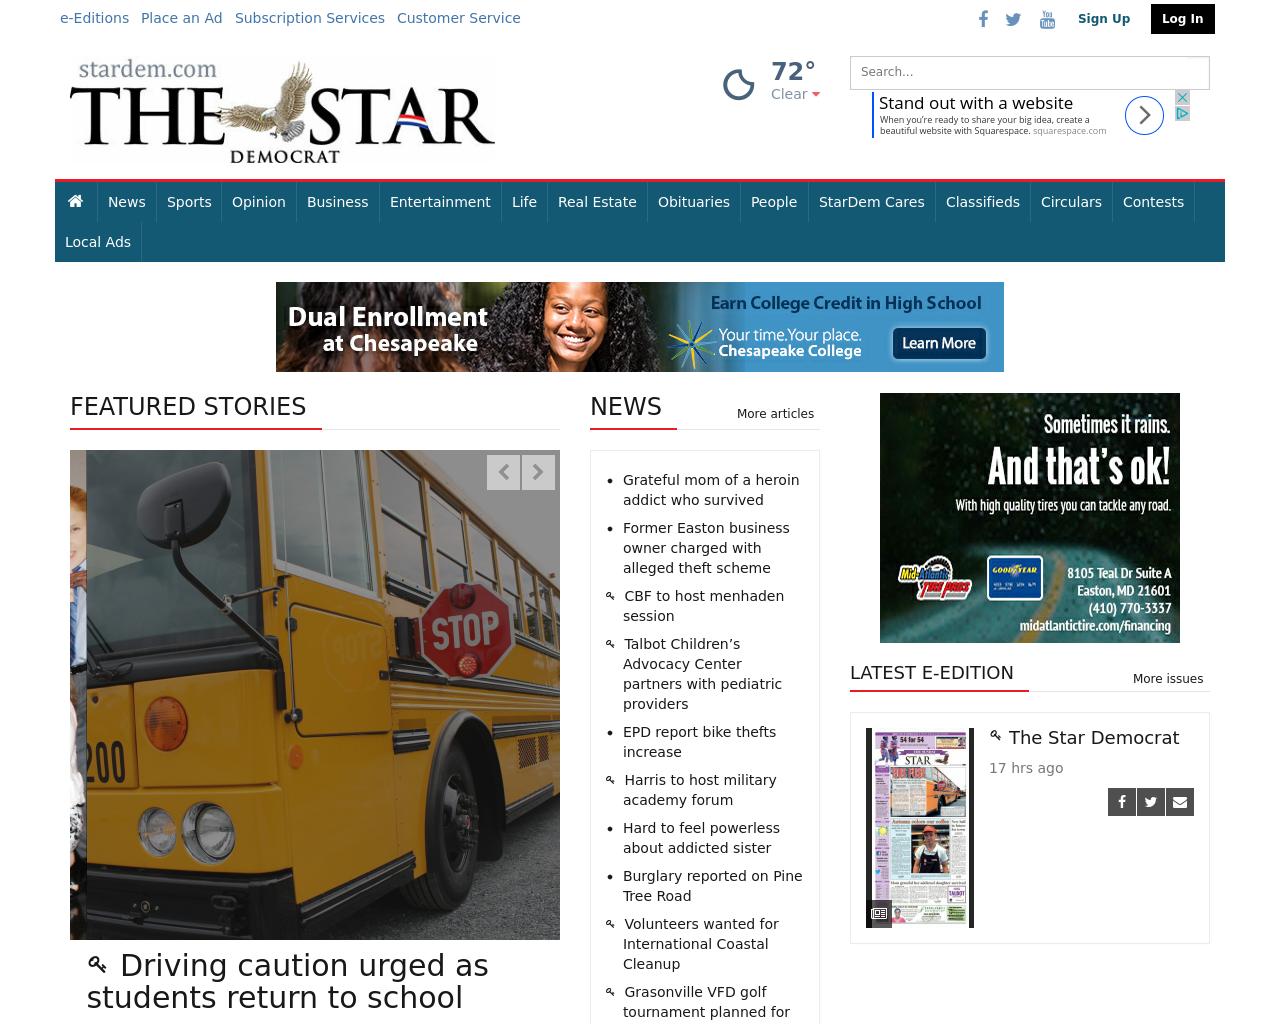 The-Star-Democrat-Advertising-Reviews-Pricing